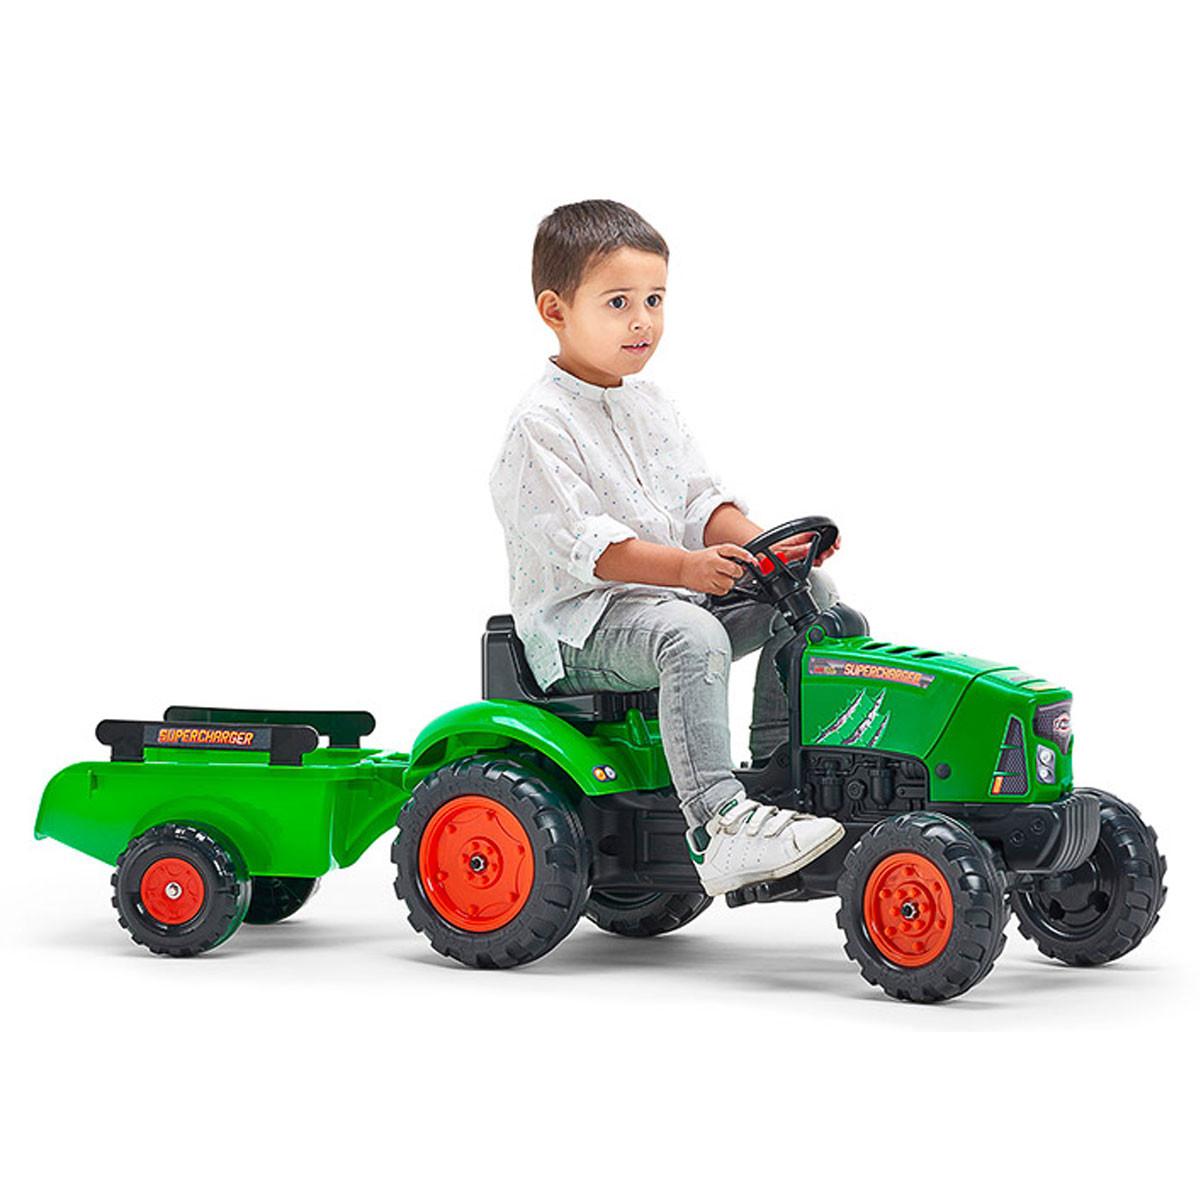 Трактор Falk Supercharger, зелен